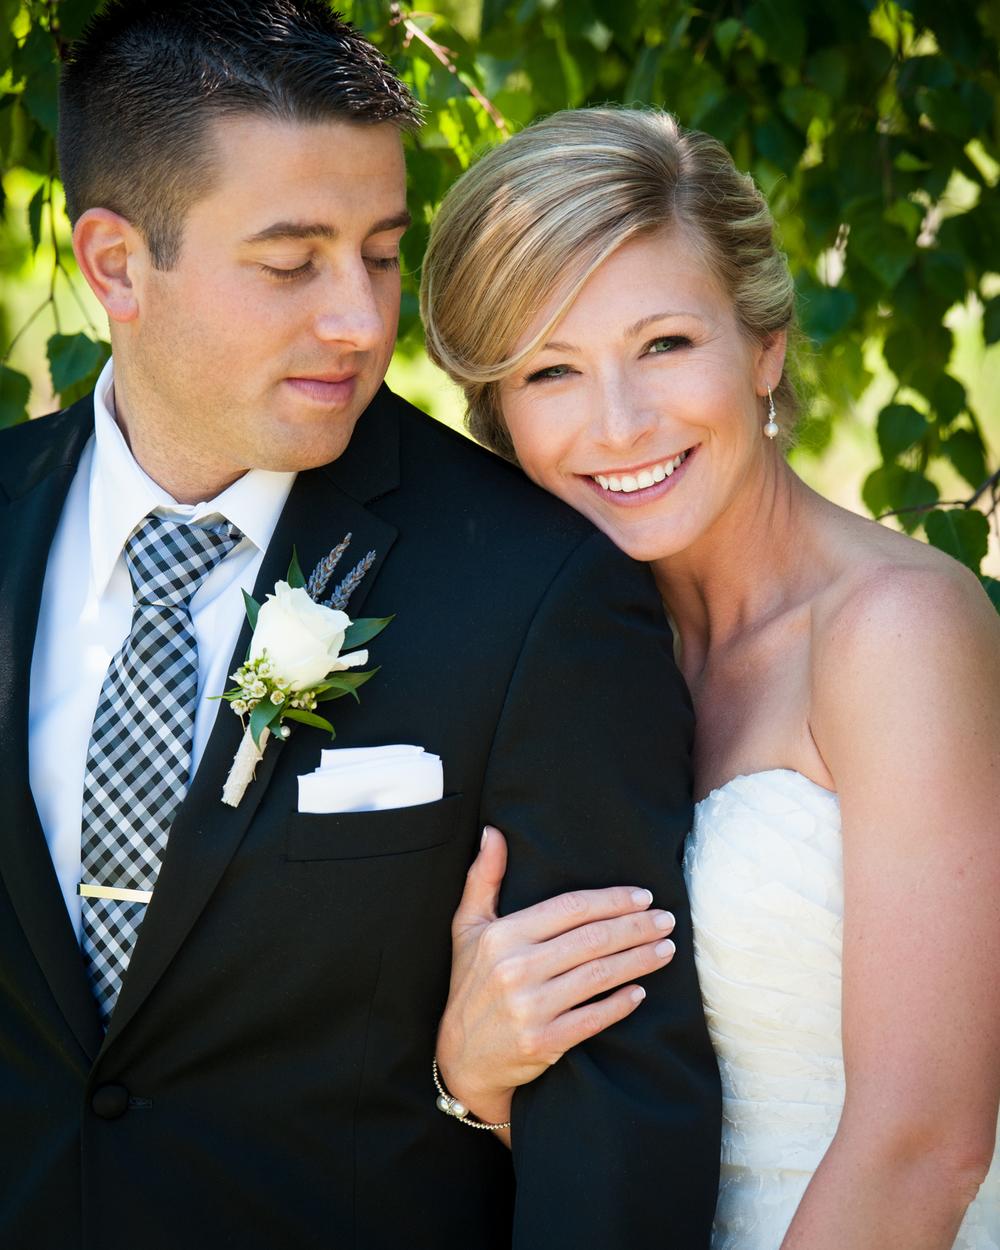 Rochester Wedding Photography 007.jpg